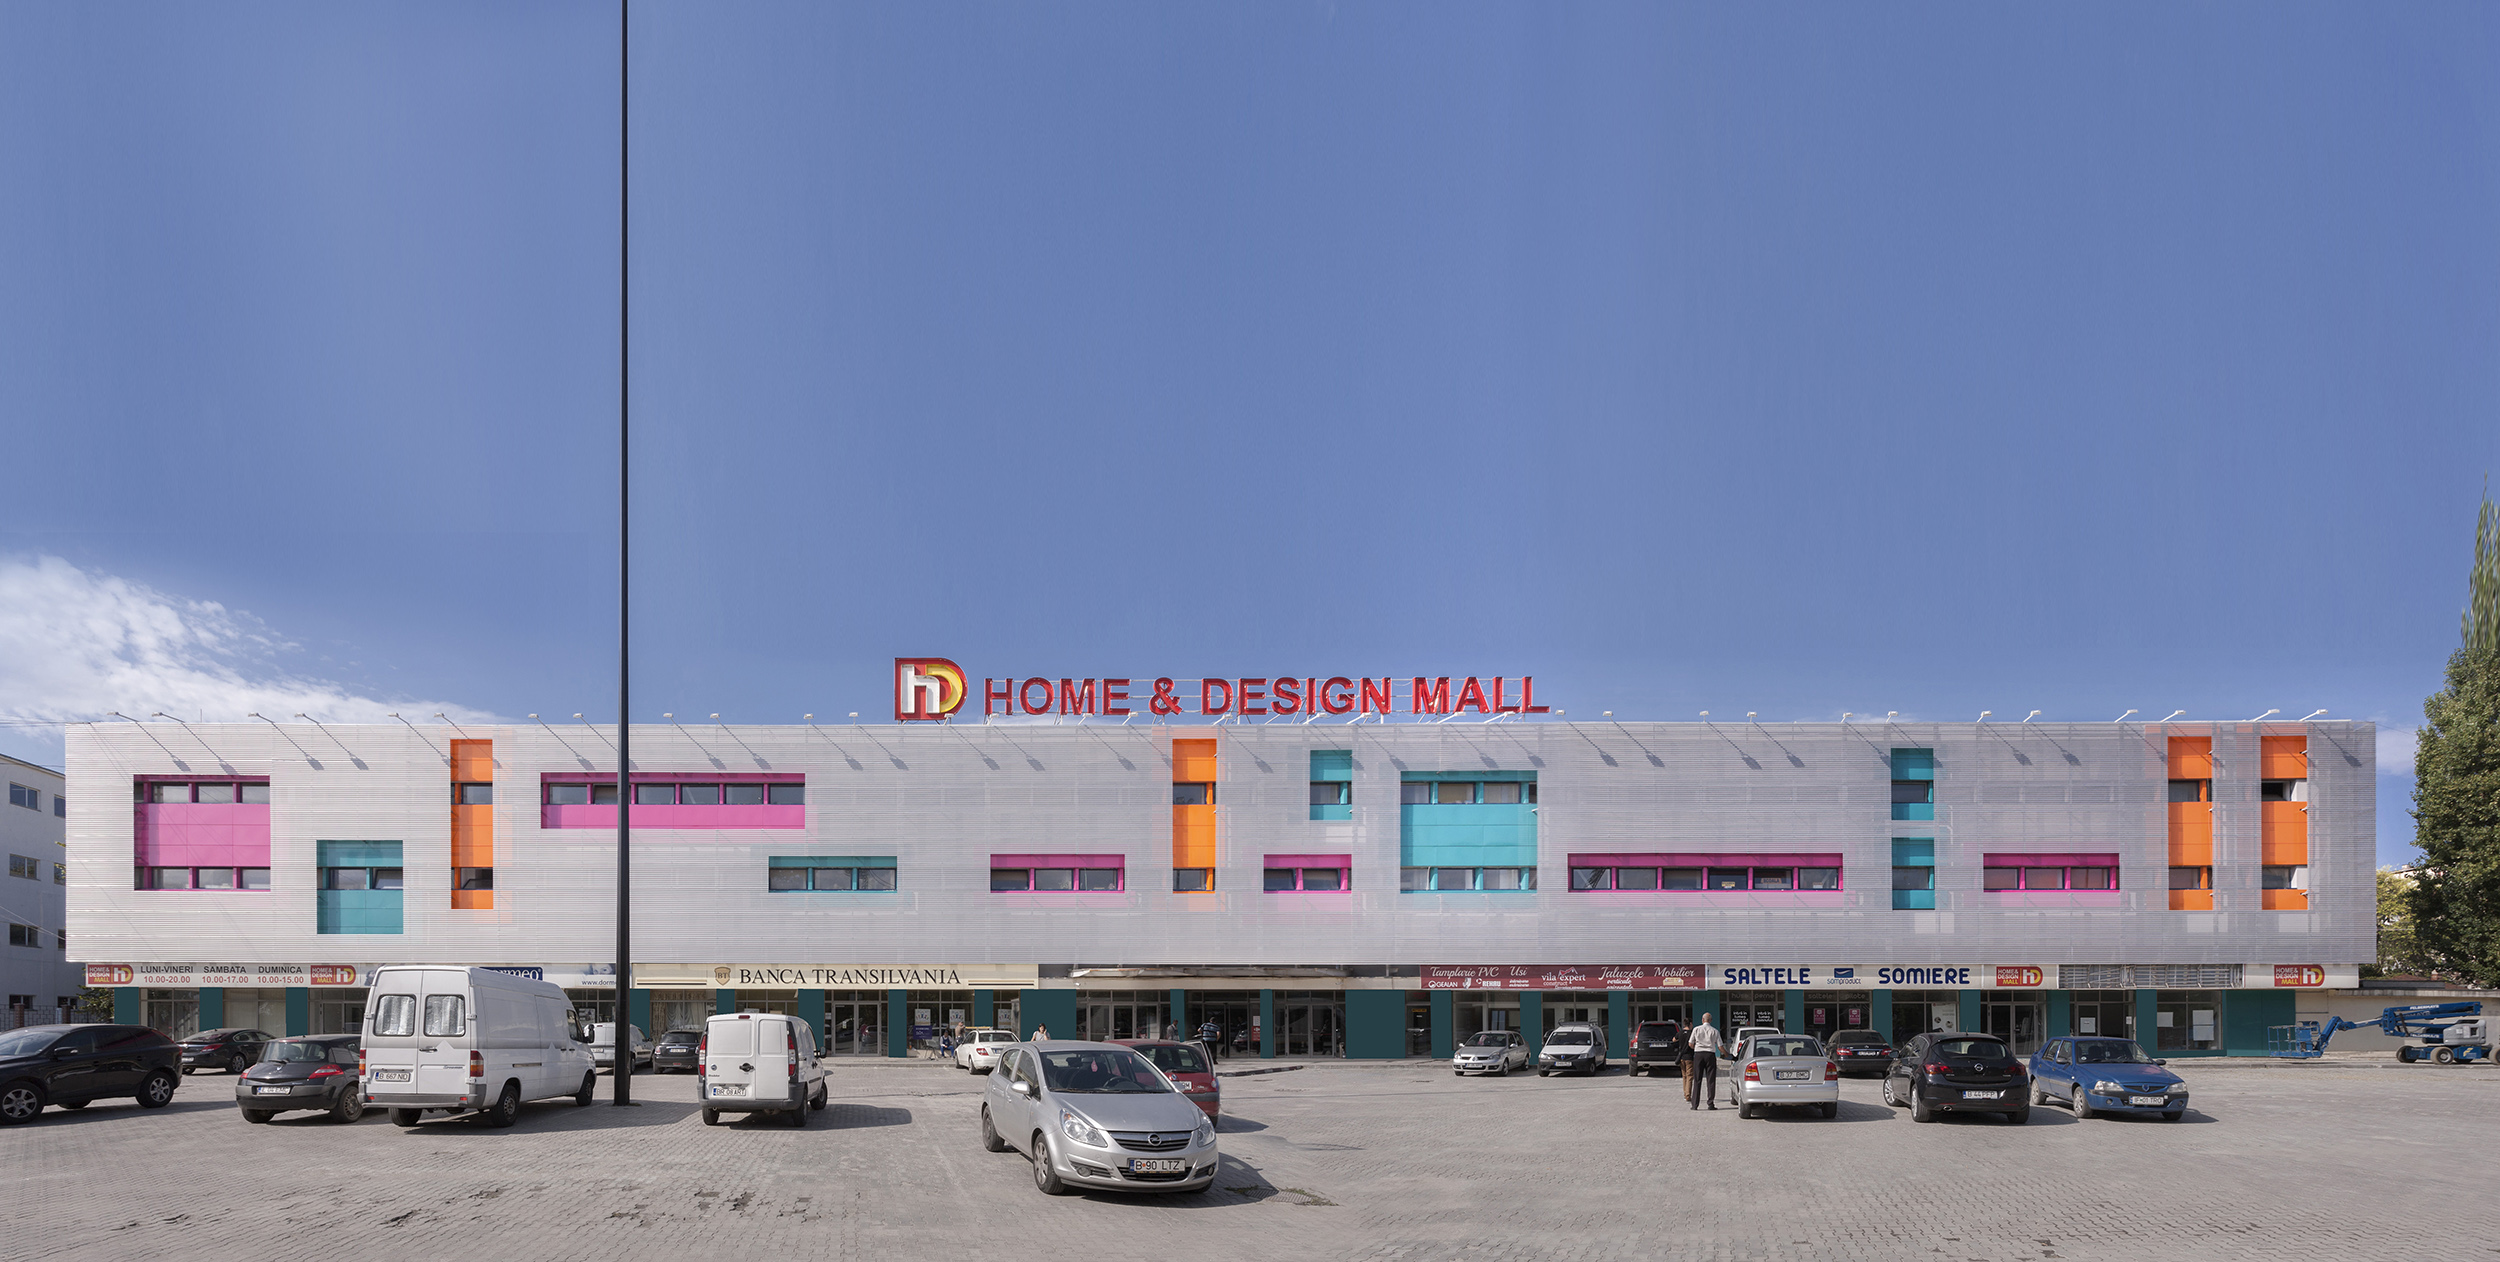 https://nbc-arhitect.ro/wp-content/uploads/2020/10/NBC-Arhitect-_-HD-MALL-_-Bucharest-_-interior_design_mall_4.jpg